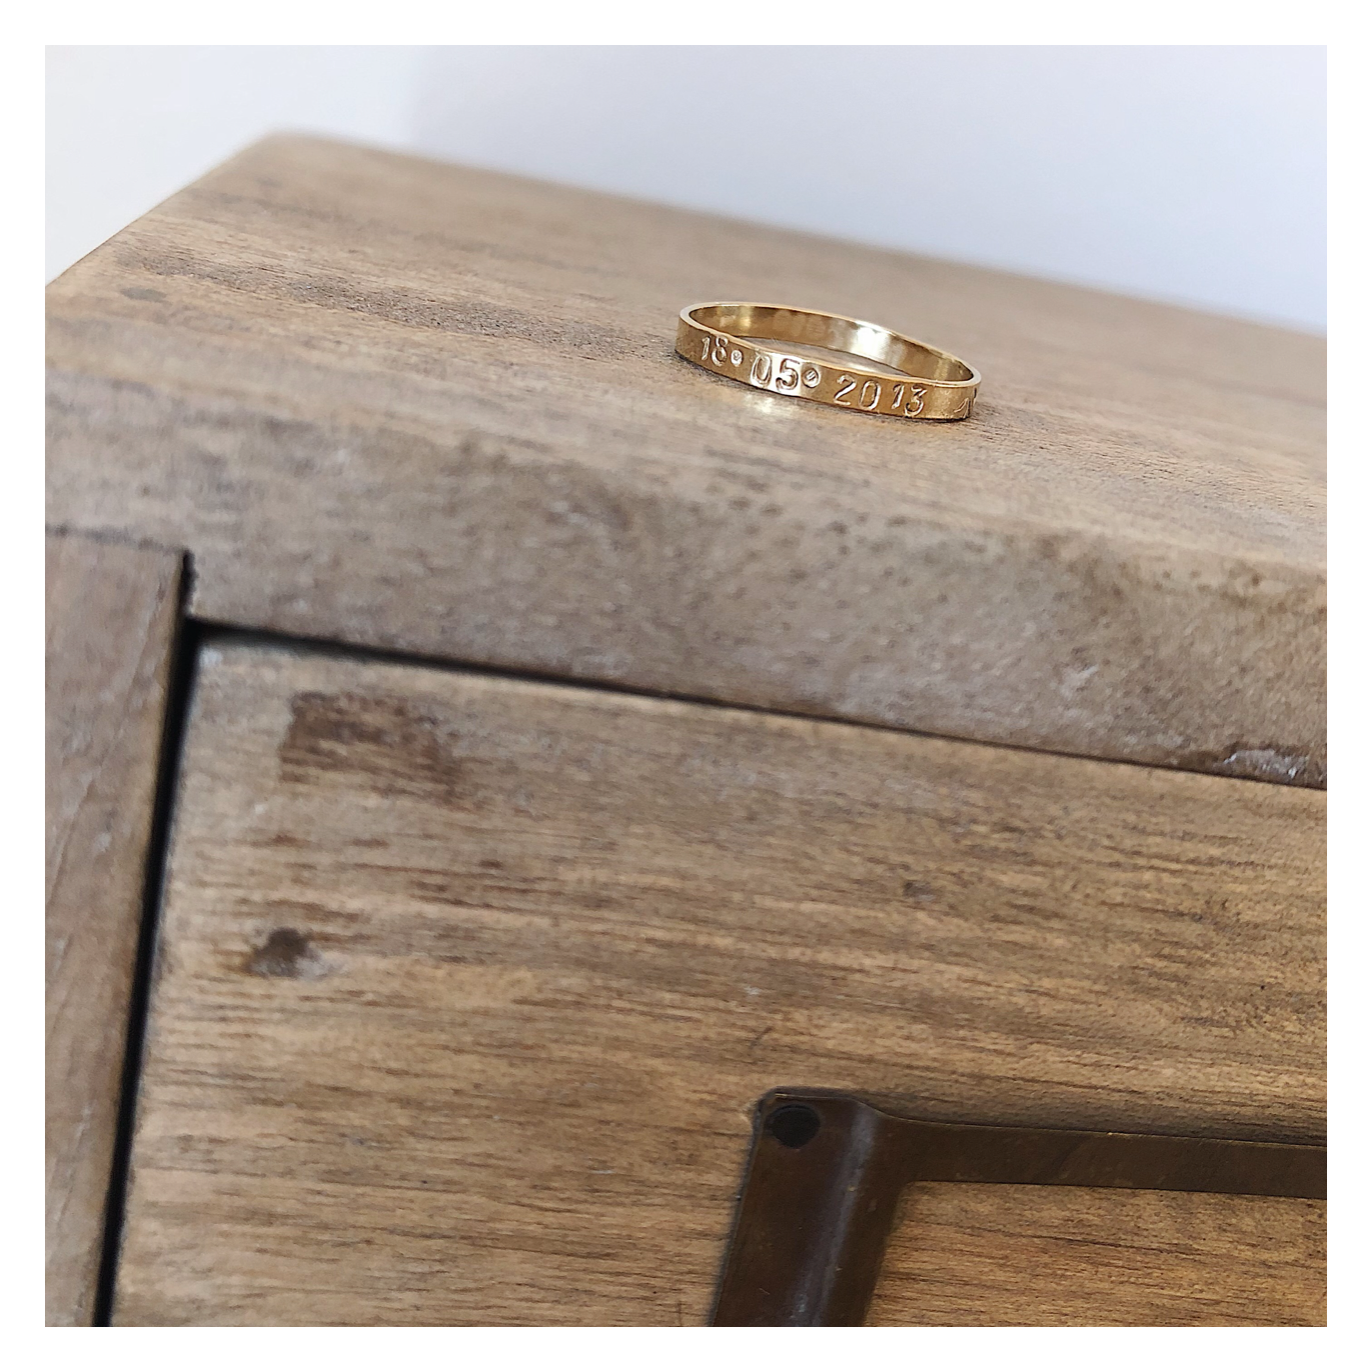 Personalised 14k Gold Filled Stacking Ring - Size H, J, L, N, P GFRING